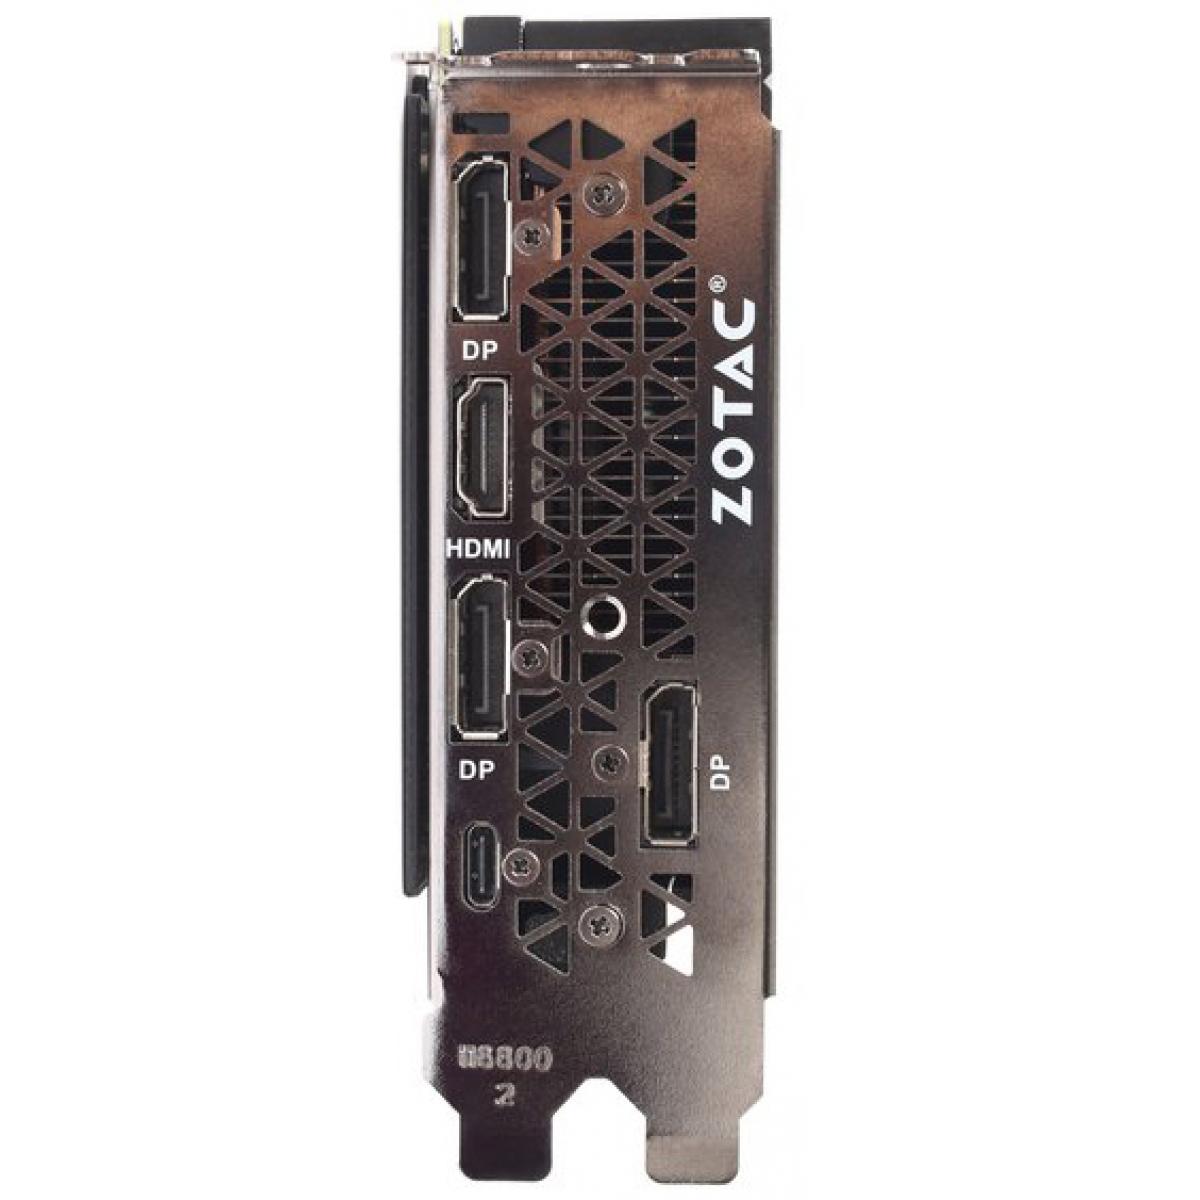 Placa de Vídeo Zotac GeForce RTX 2080 Blower, 8GB GDDR6, 256Bit, ZT-T20800A-10P